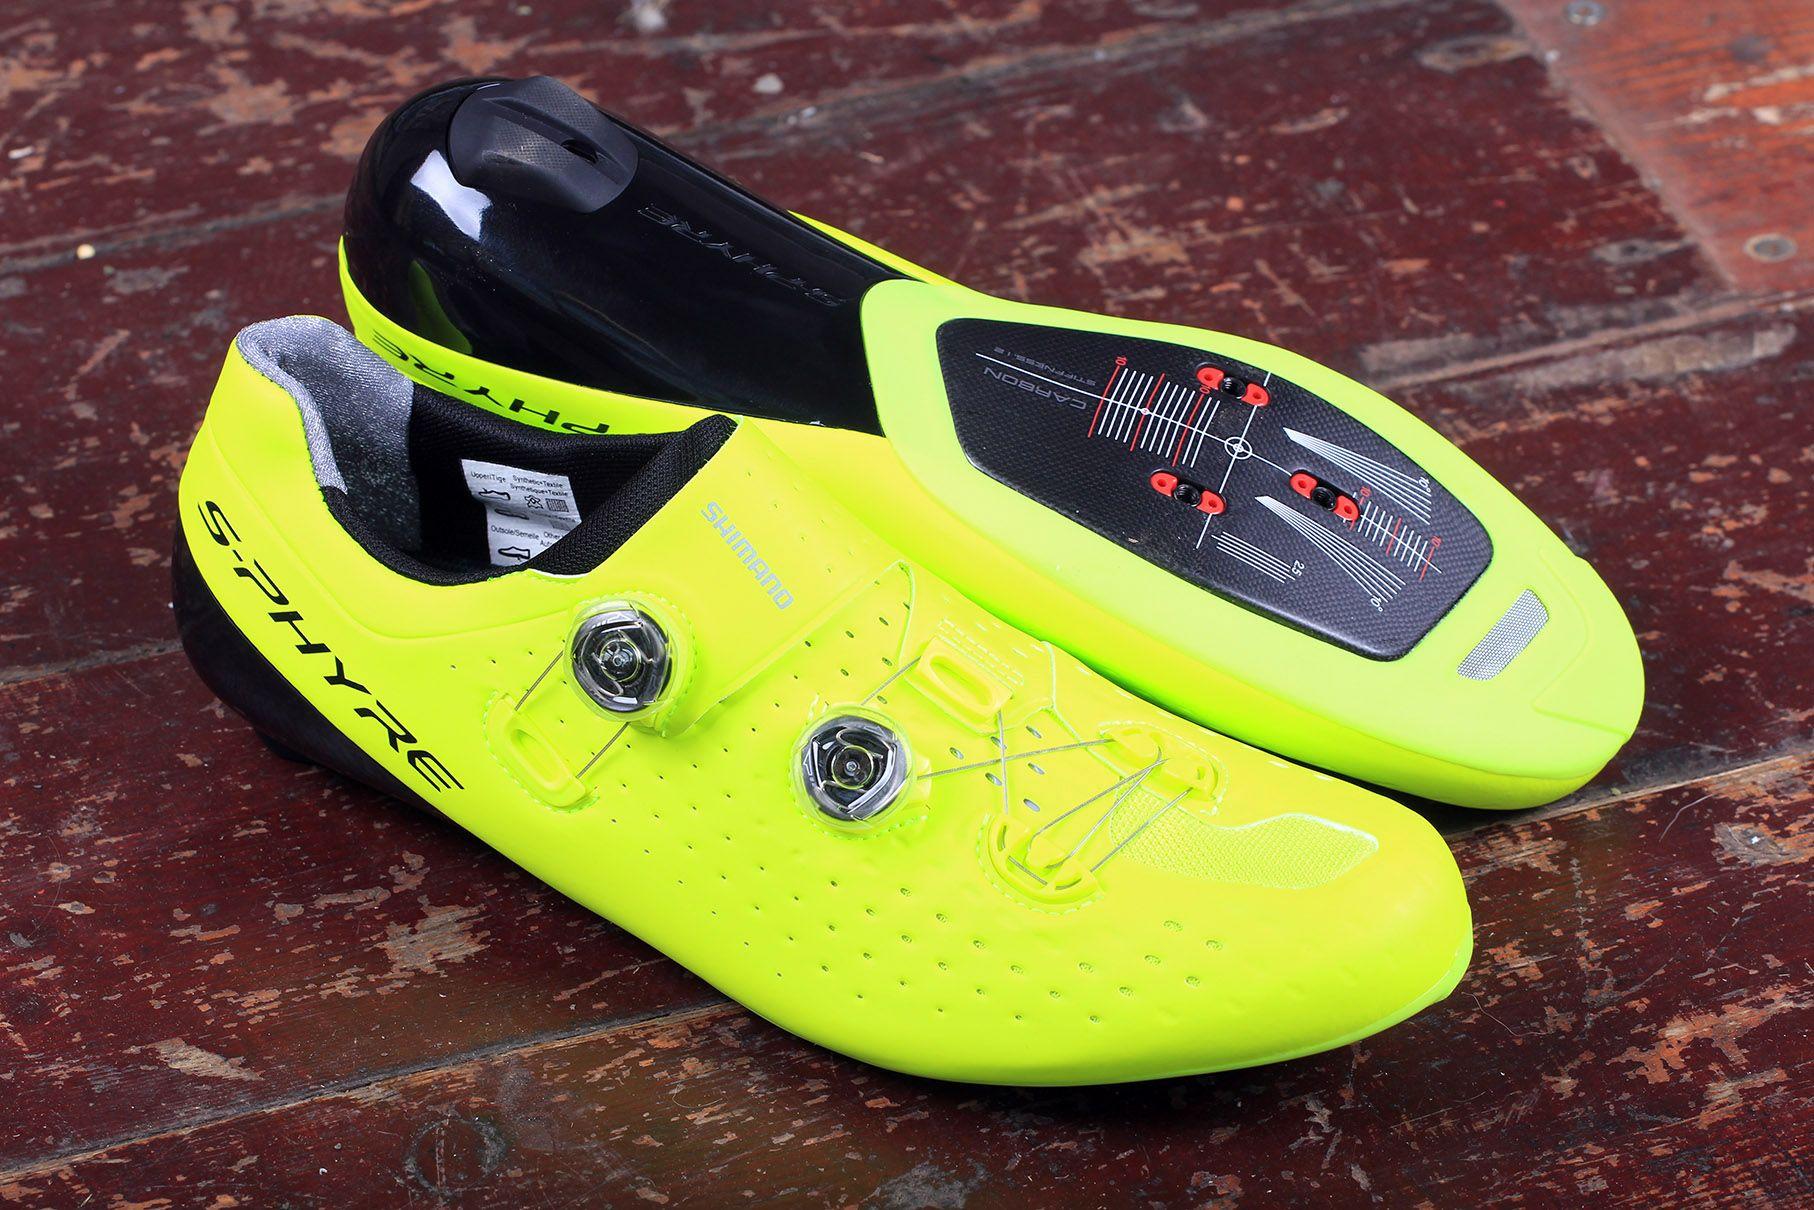 Shimano RC9 S-Phyre SPD-SL shoes